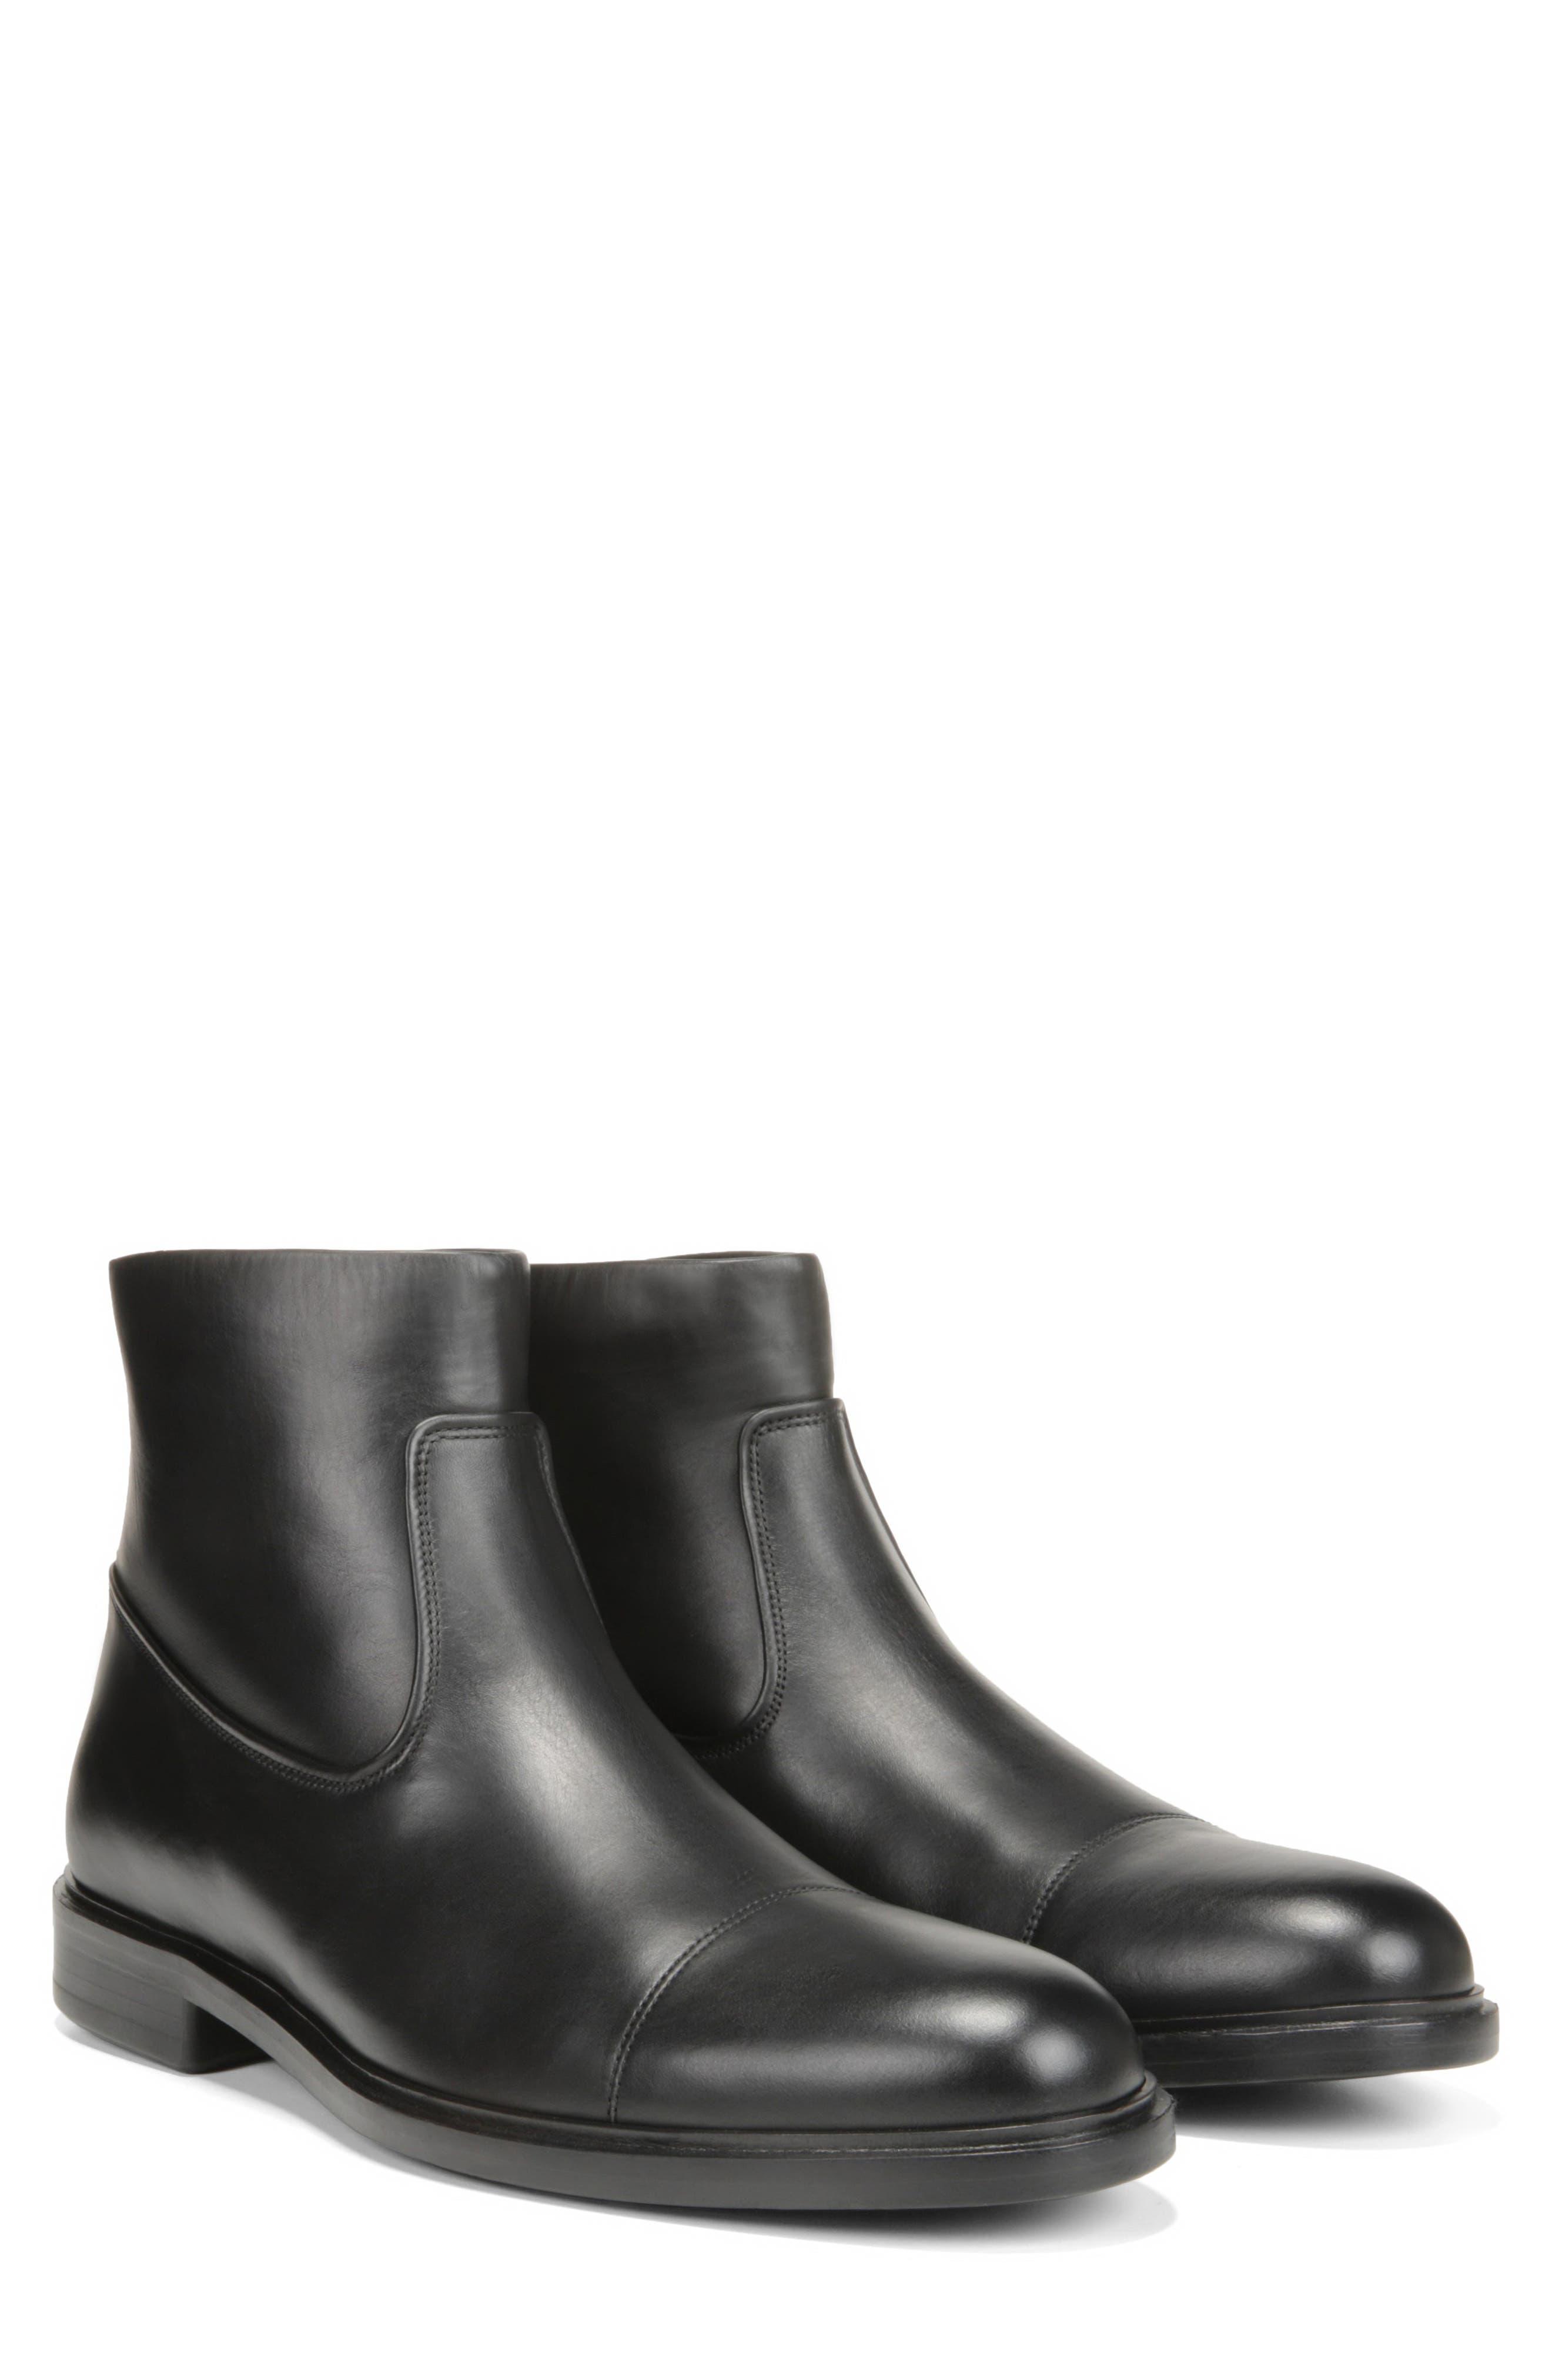 Beckett Zip Boot,                             Alternate thumbnail 8, color,                             BLACK